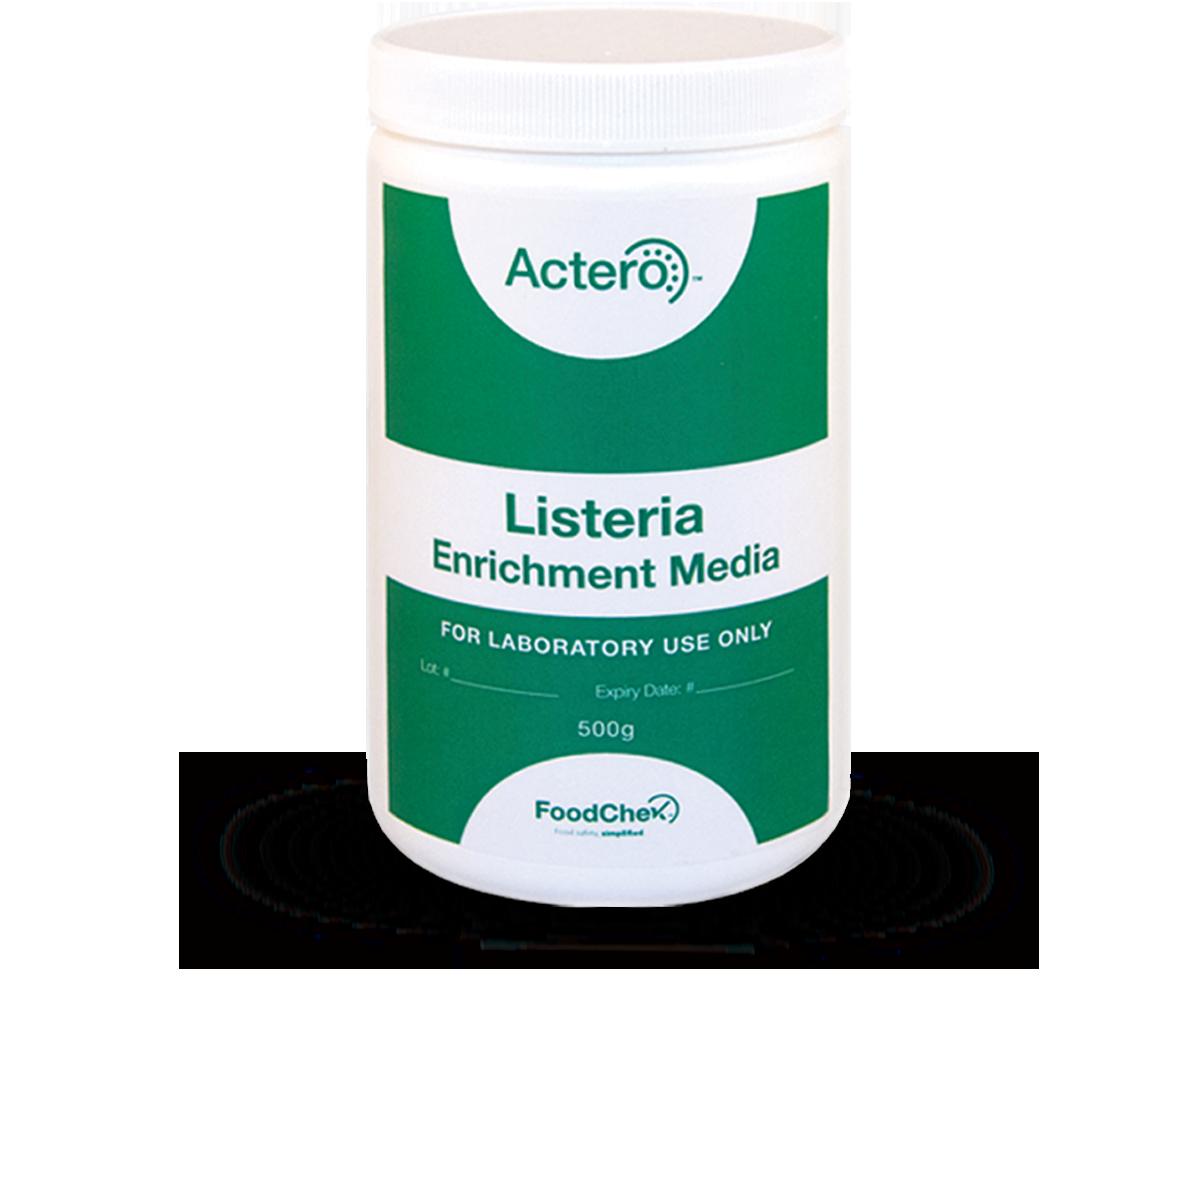 Actero Listeria Elite Enrichment Media